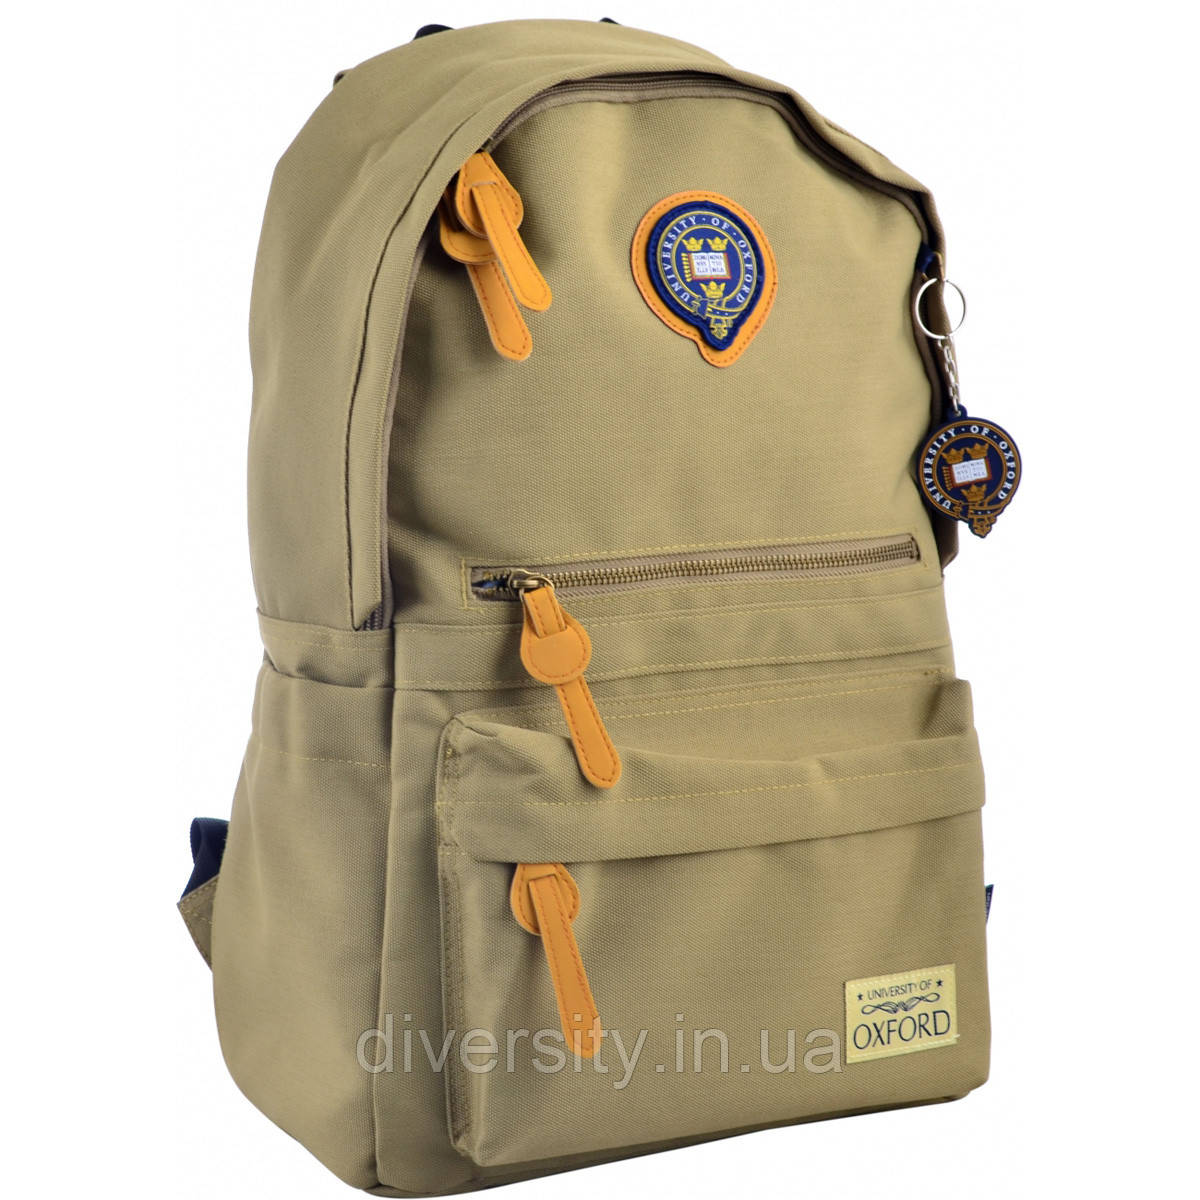 Молодежный рюкзак YES  OX 402,  хаки